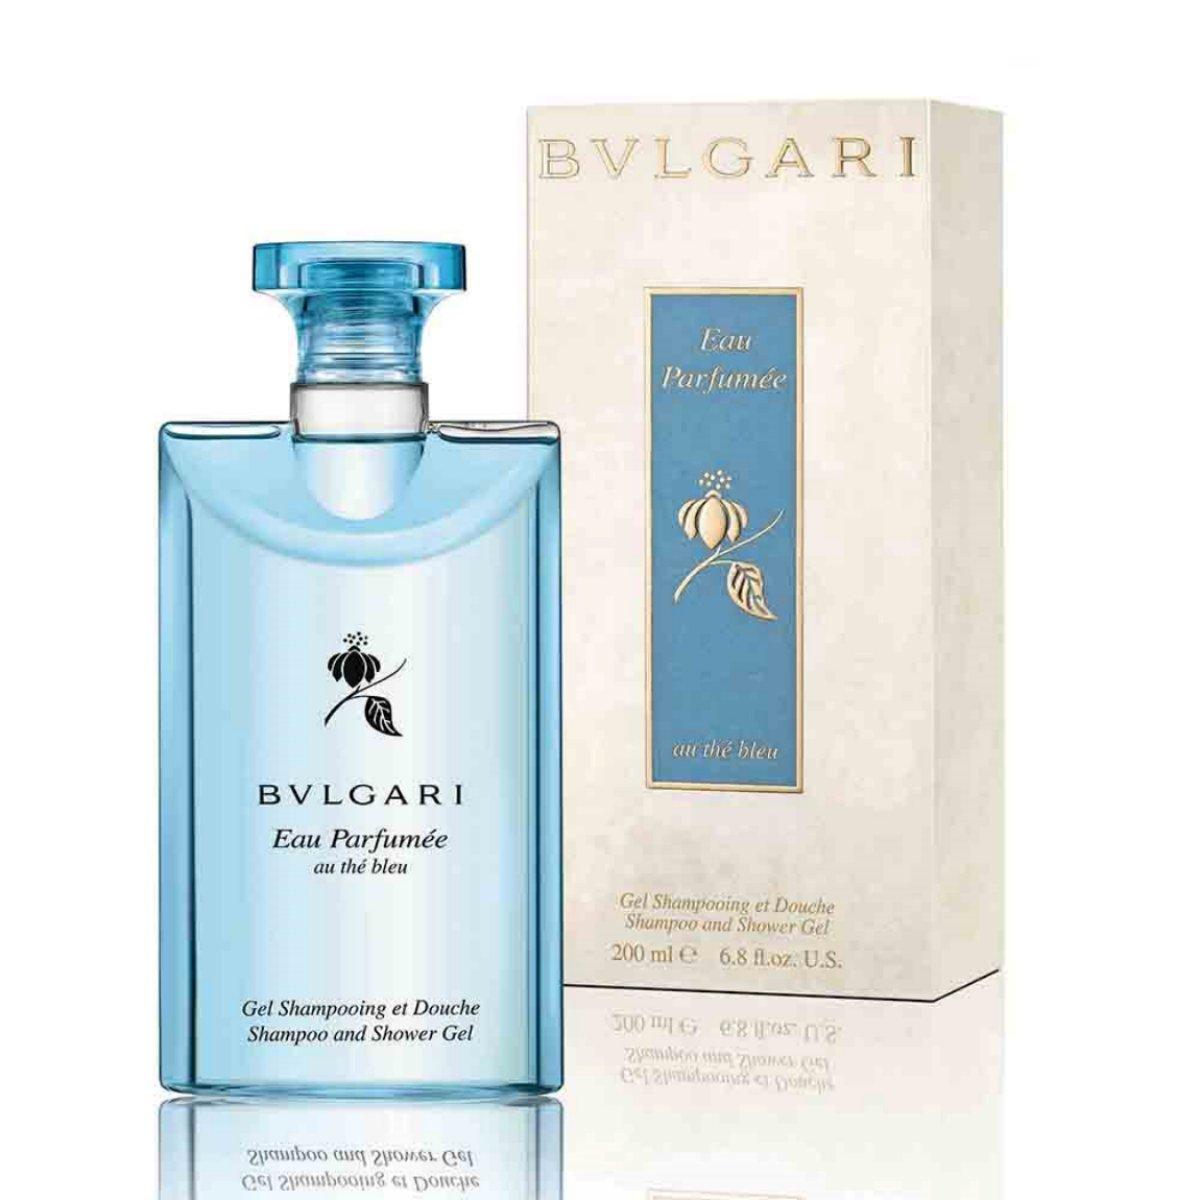 Bvlgari Eau Parfumée Thé Bleu Shampoo & Shower Gel 200ml